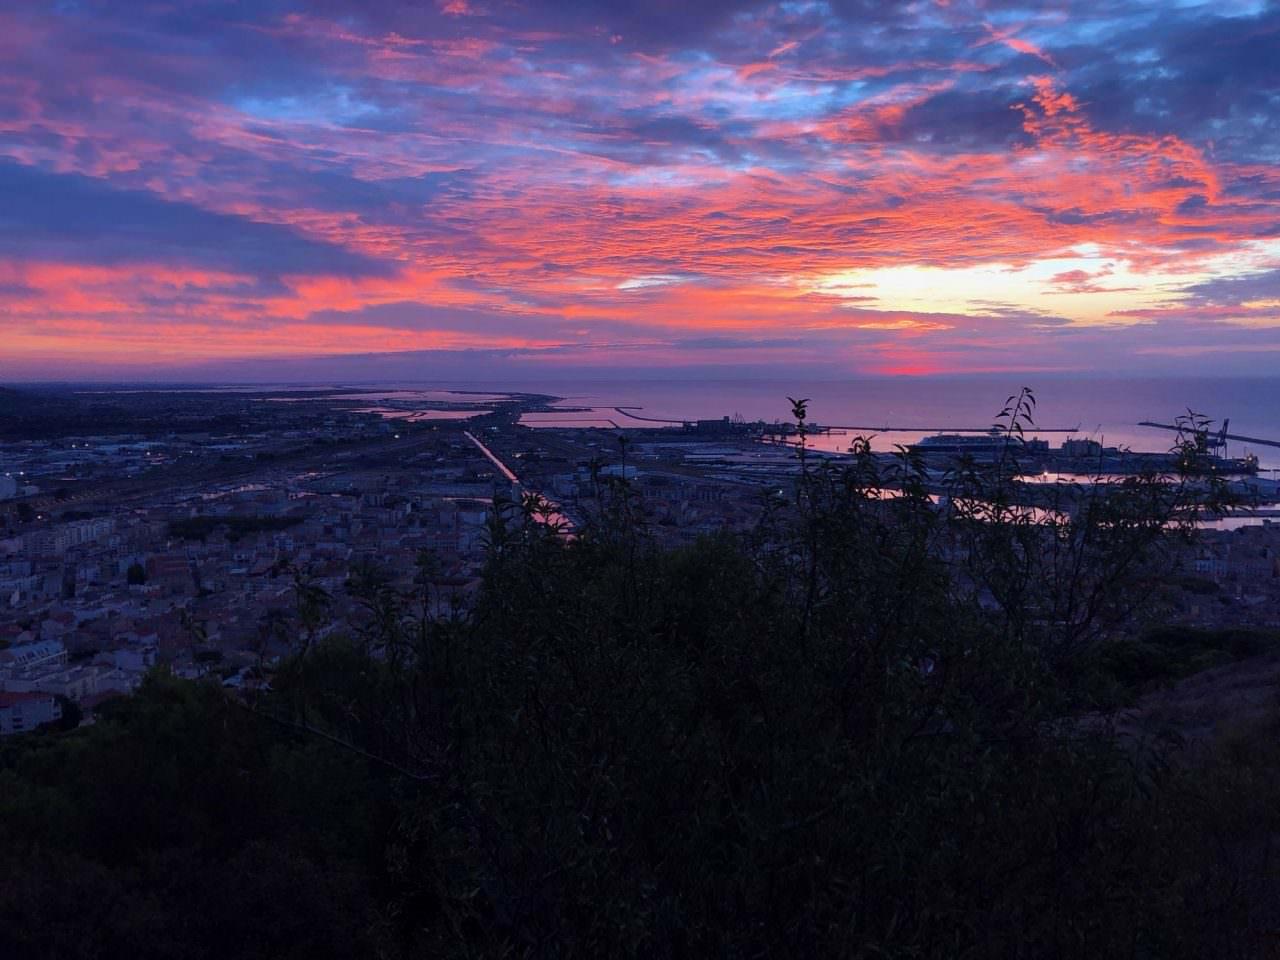 sunrise in sete